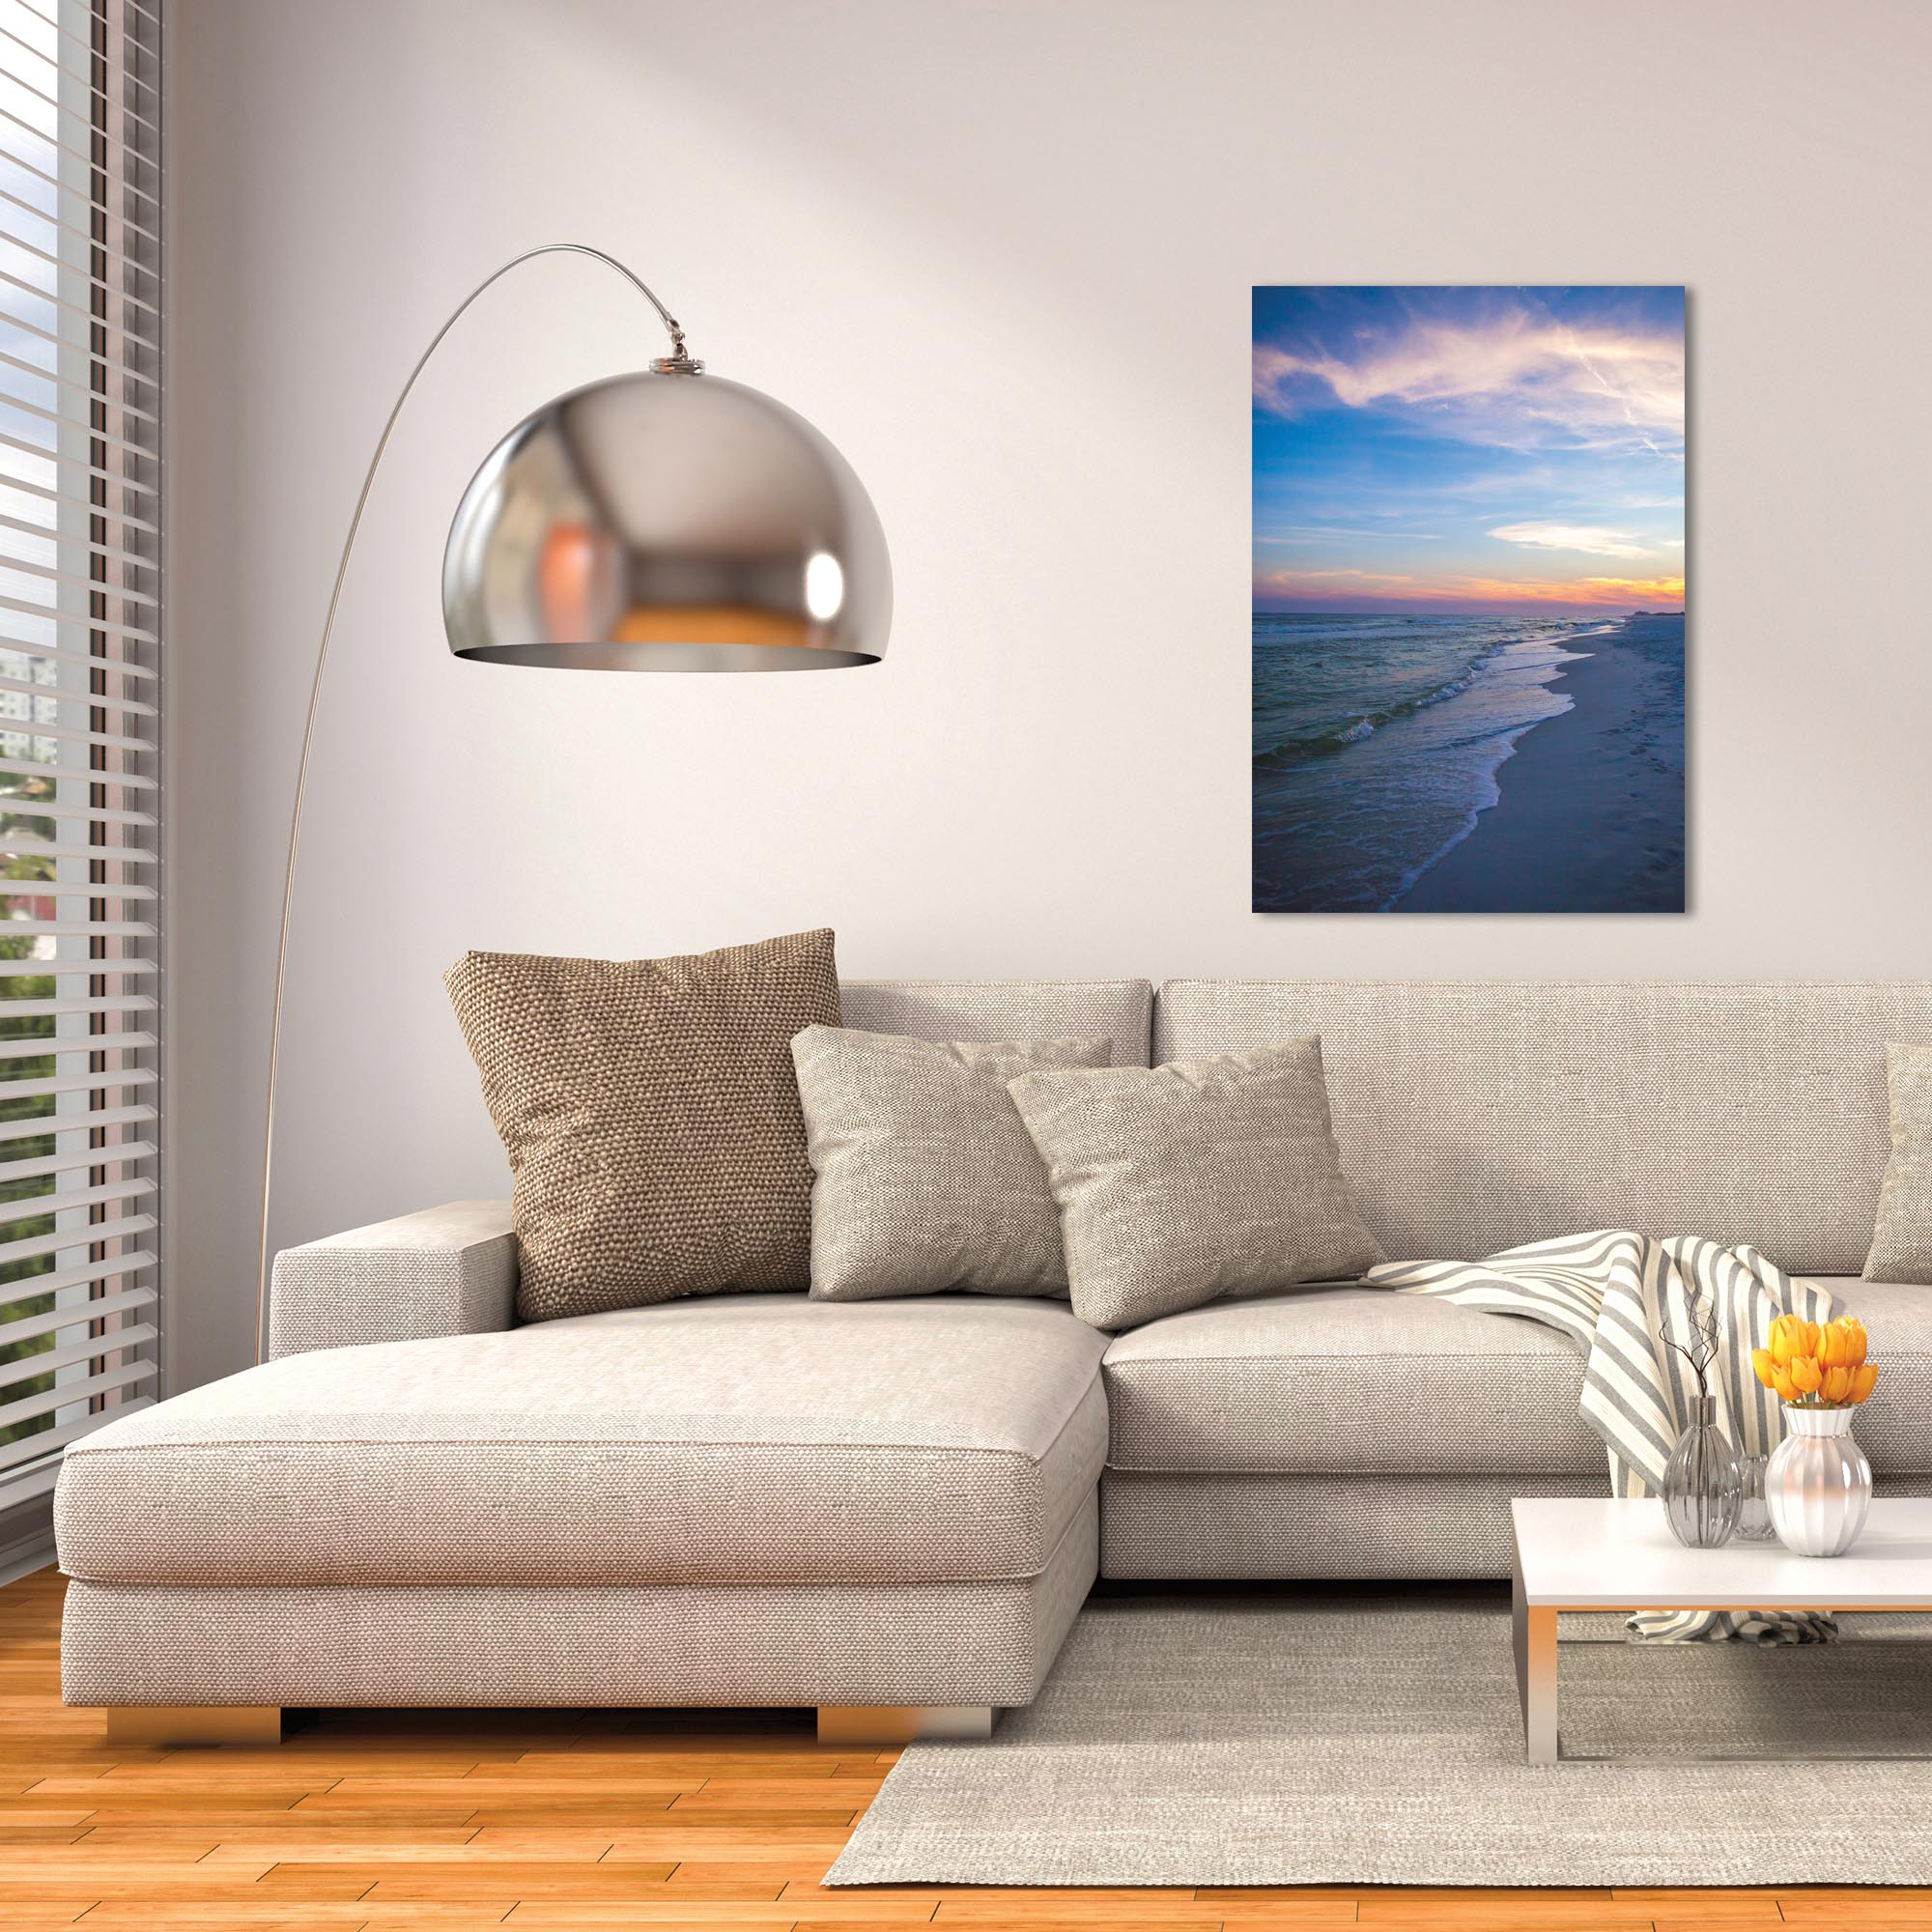 Coastal Wall Art 'Sunset Shores' - Romantic Sunset Decor on Metal or Plexiglass - Lifestyle View